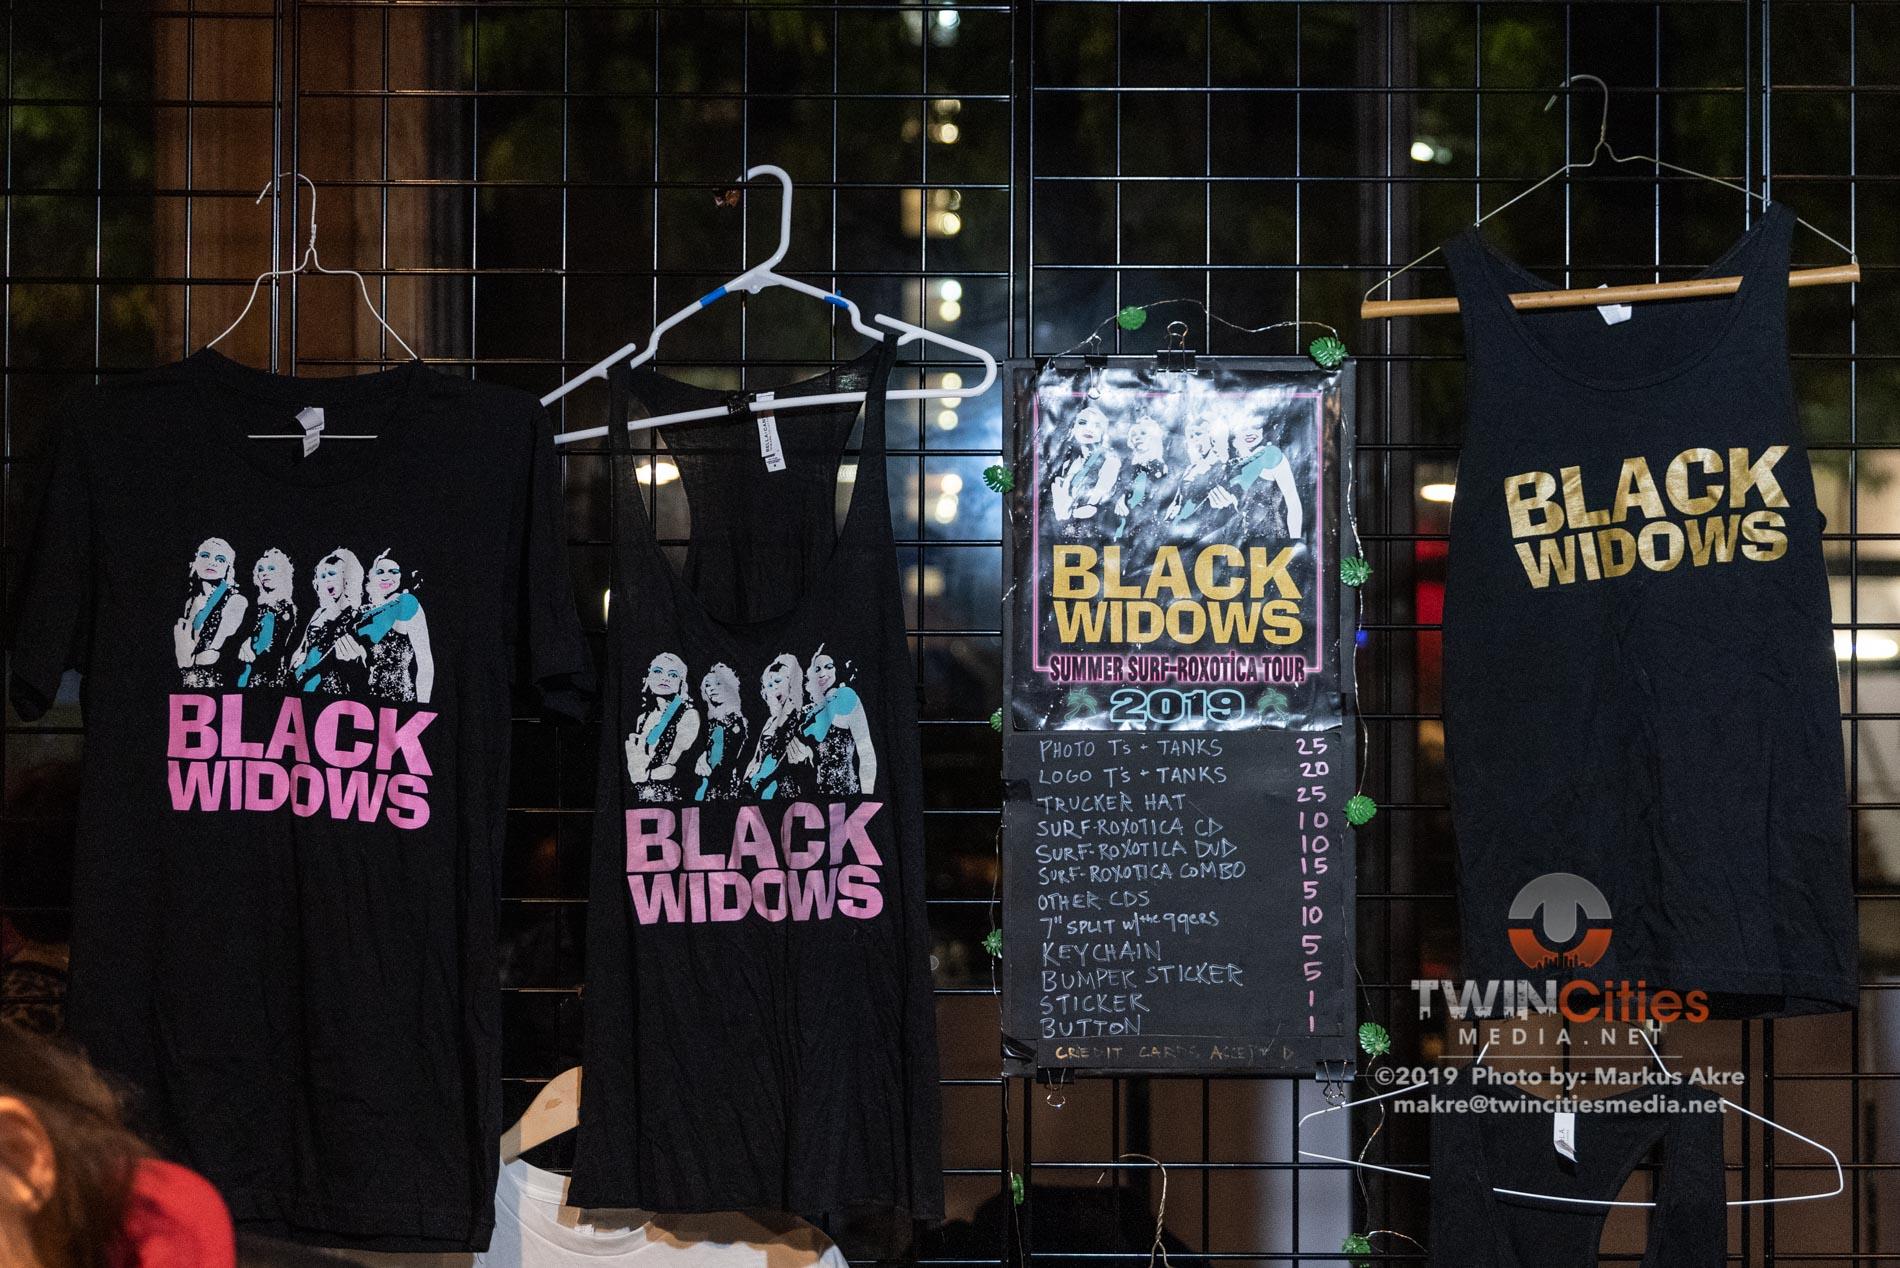 Black-Widows-1